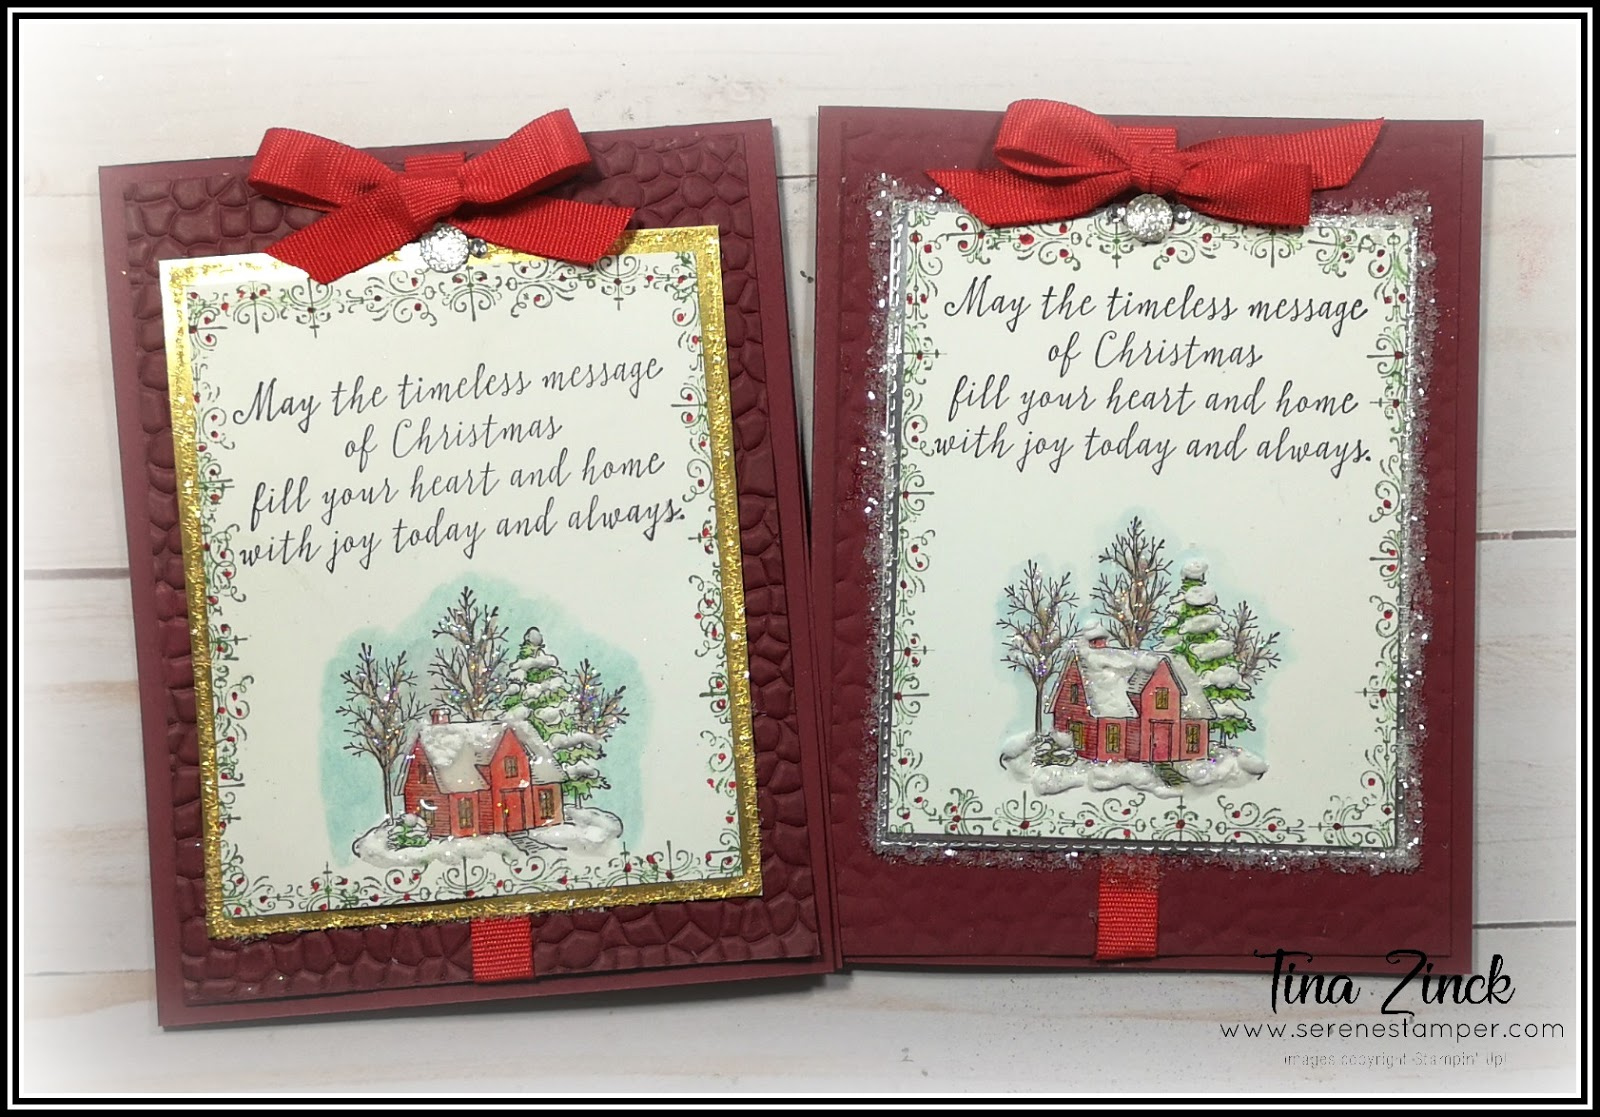 The Serene Stamper Vintage Christmas Cards With Still Scenes Stamp Set Video